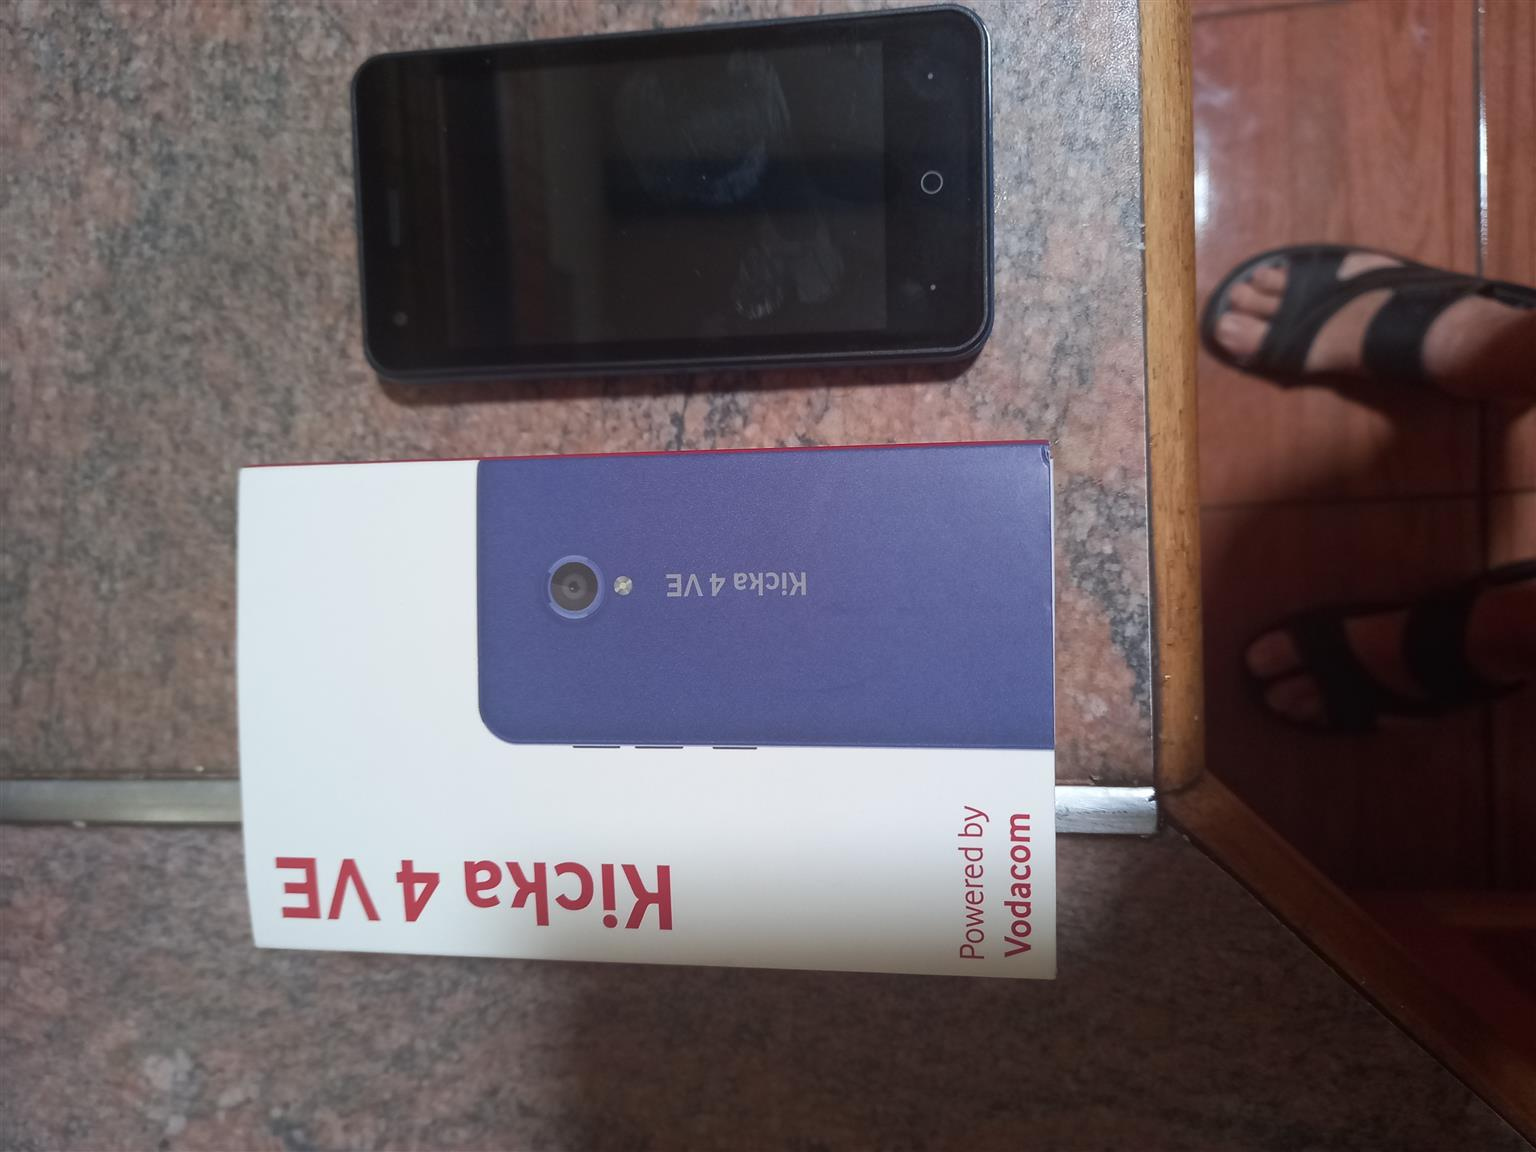 Vodacom Kicka 4 ve